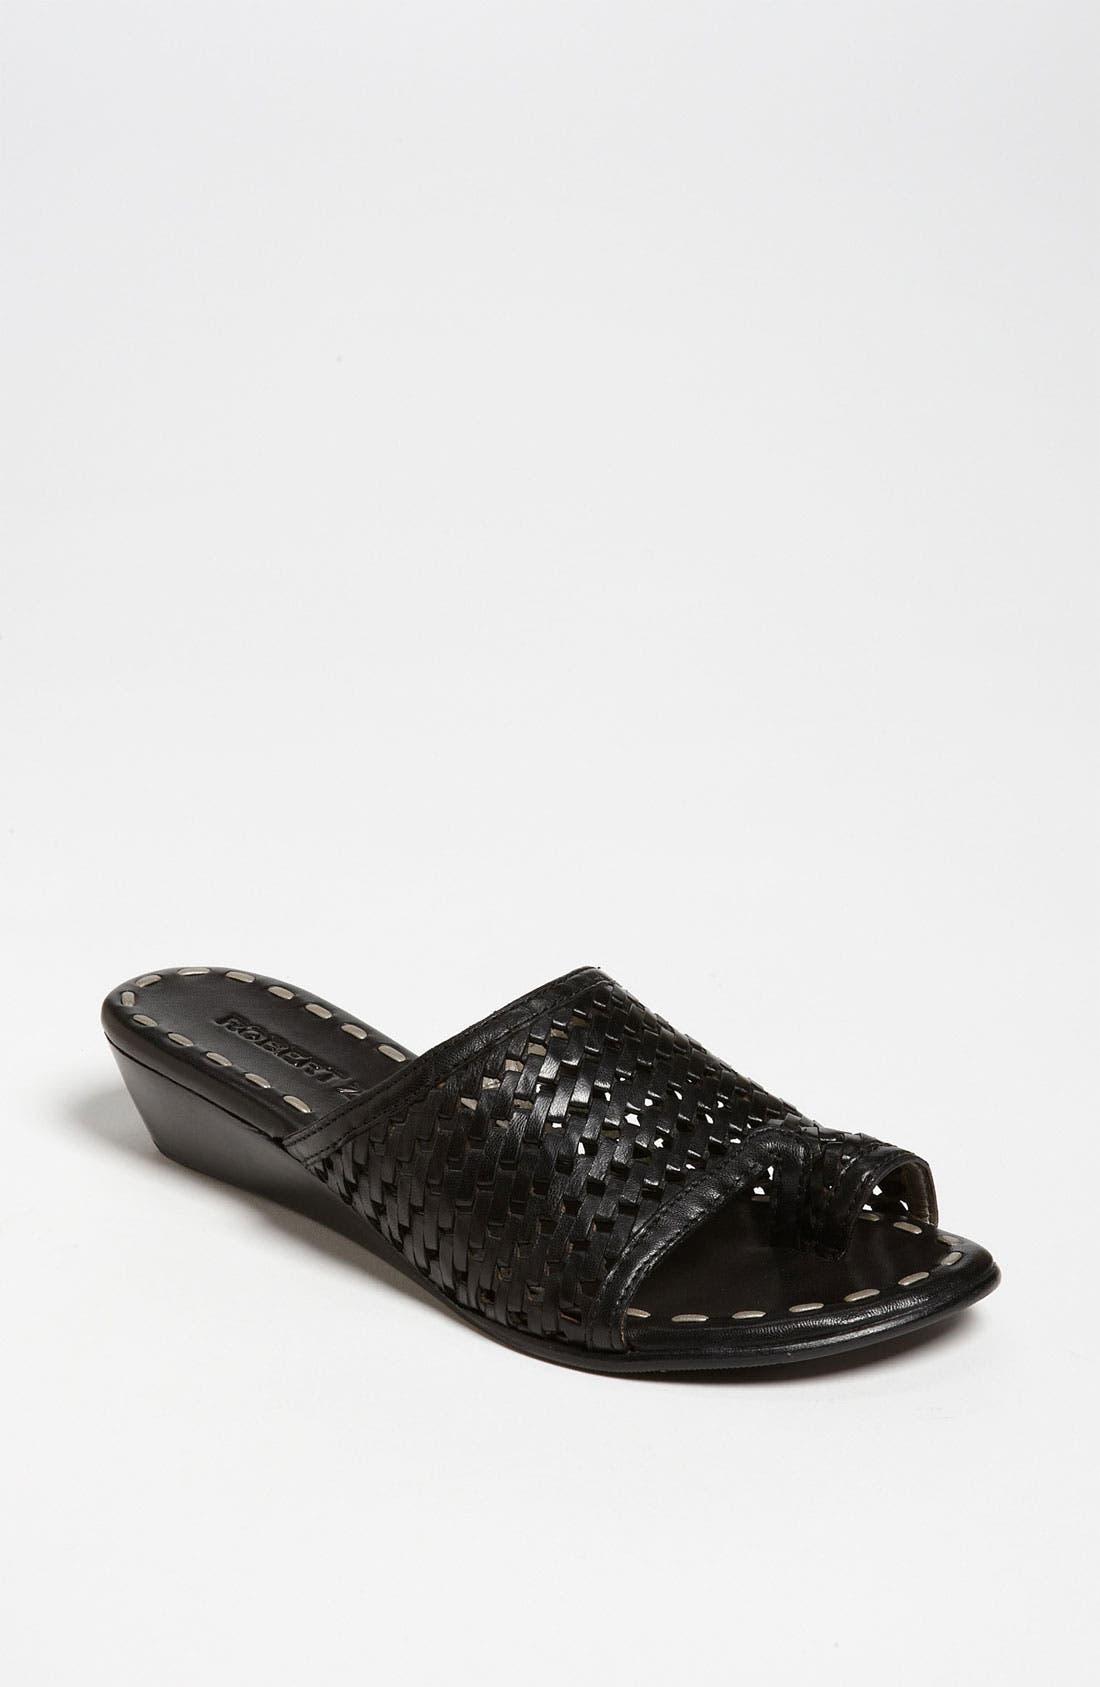 Main Image - Robert Zur 'Tides' Sandal